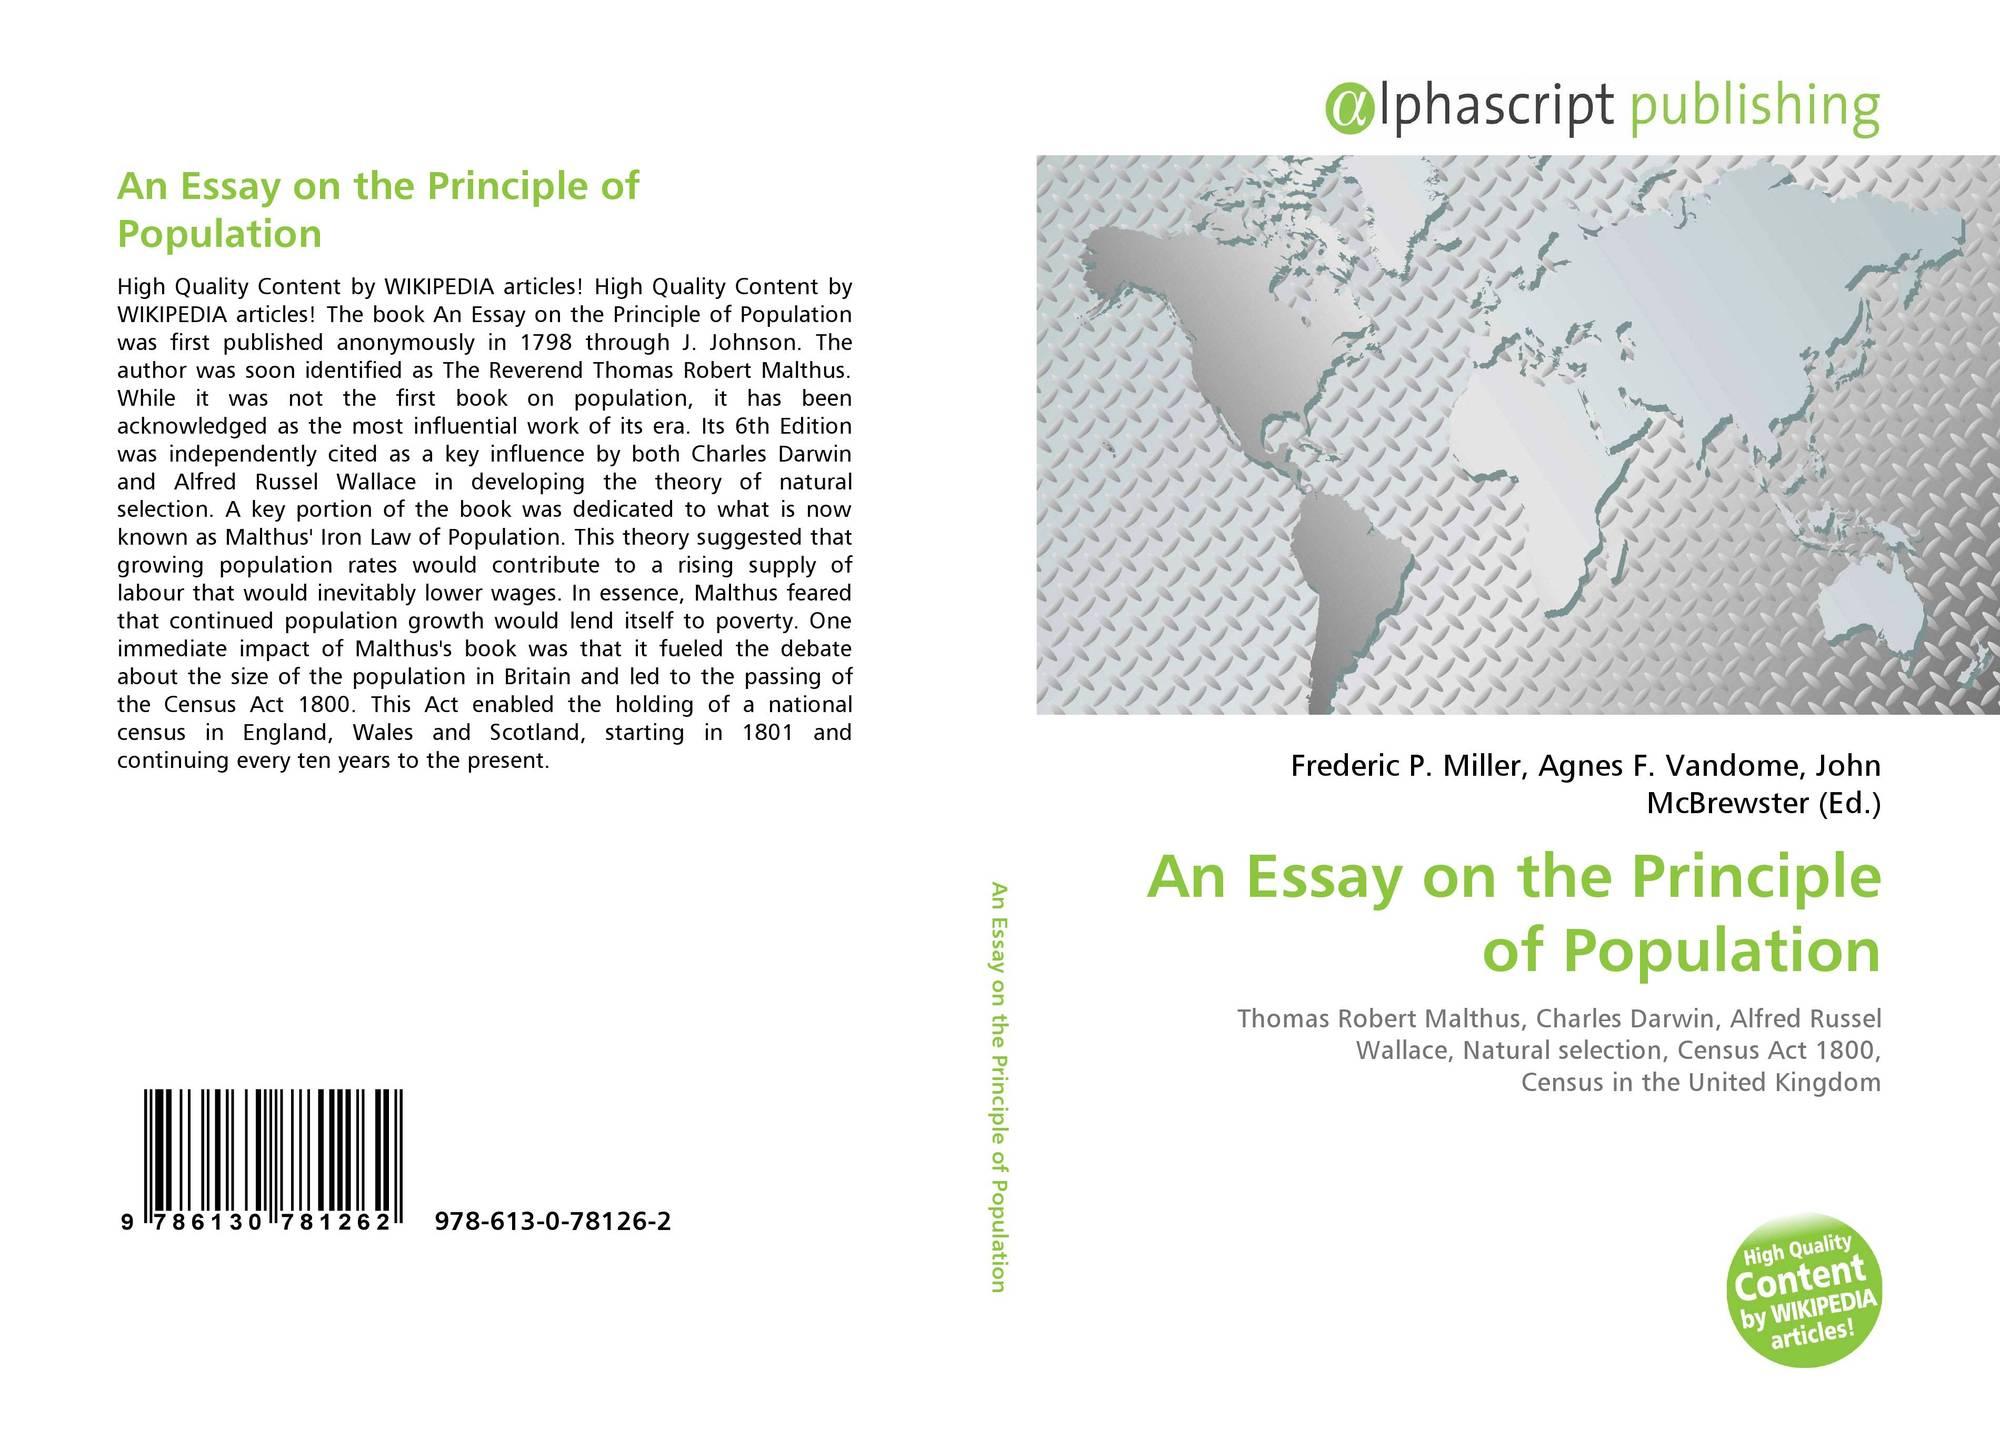 022 Essay On The Principle Of Population Example Singular Pdf By Thomas Malthus Main Idea Full